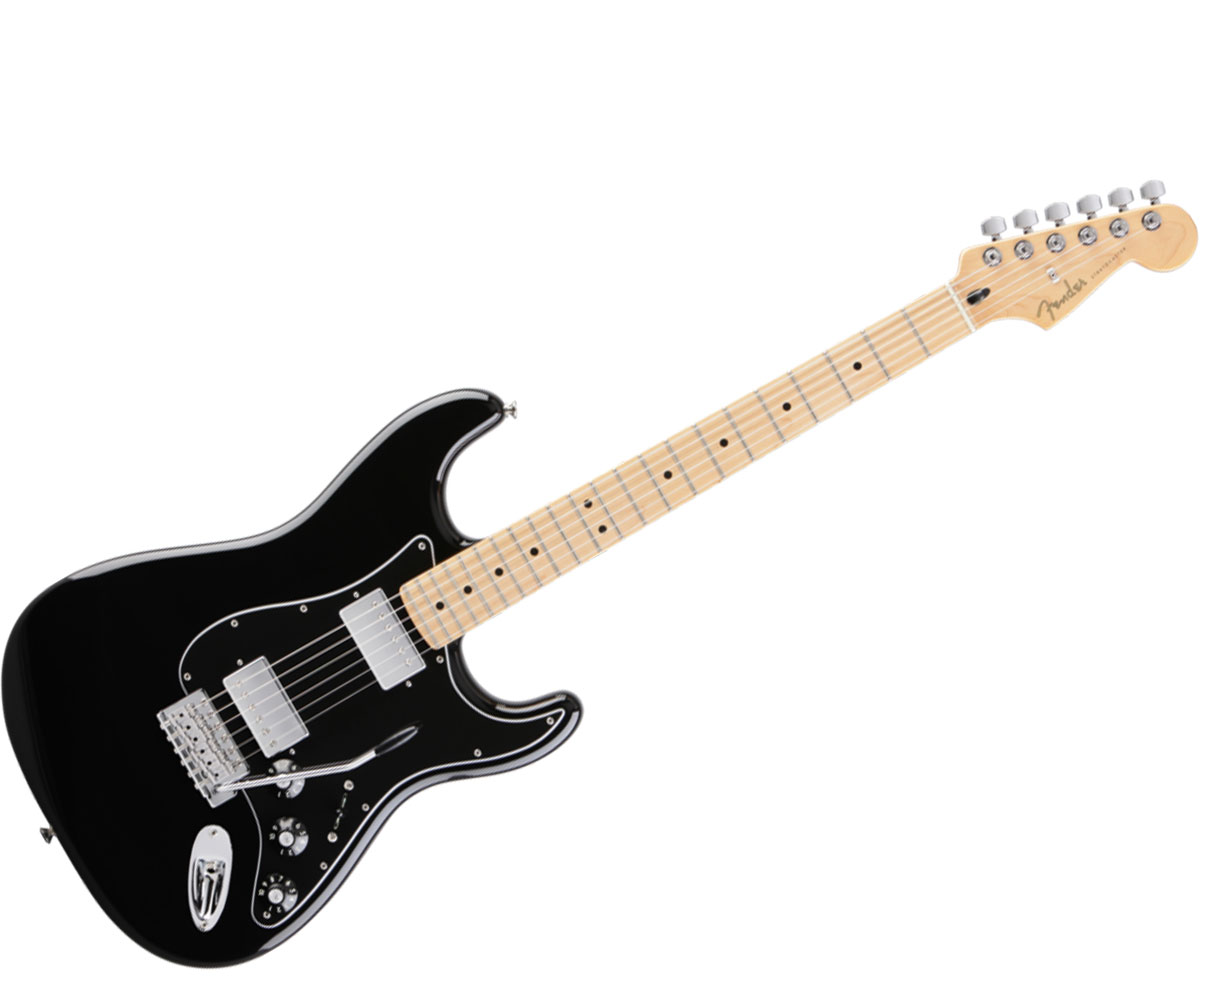 Fender Blacktop Stratocaster Hh Guitar Maple Black